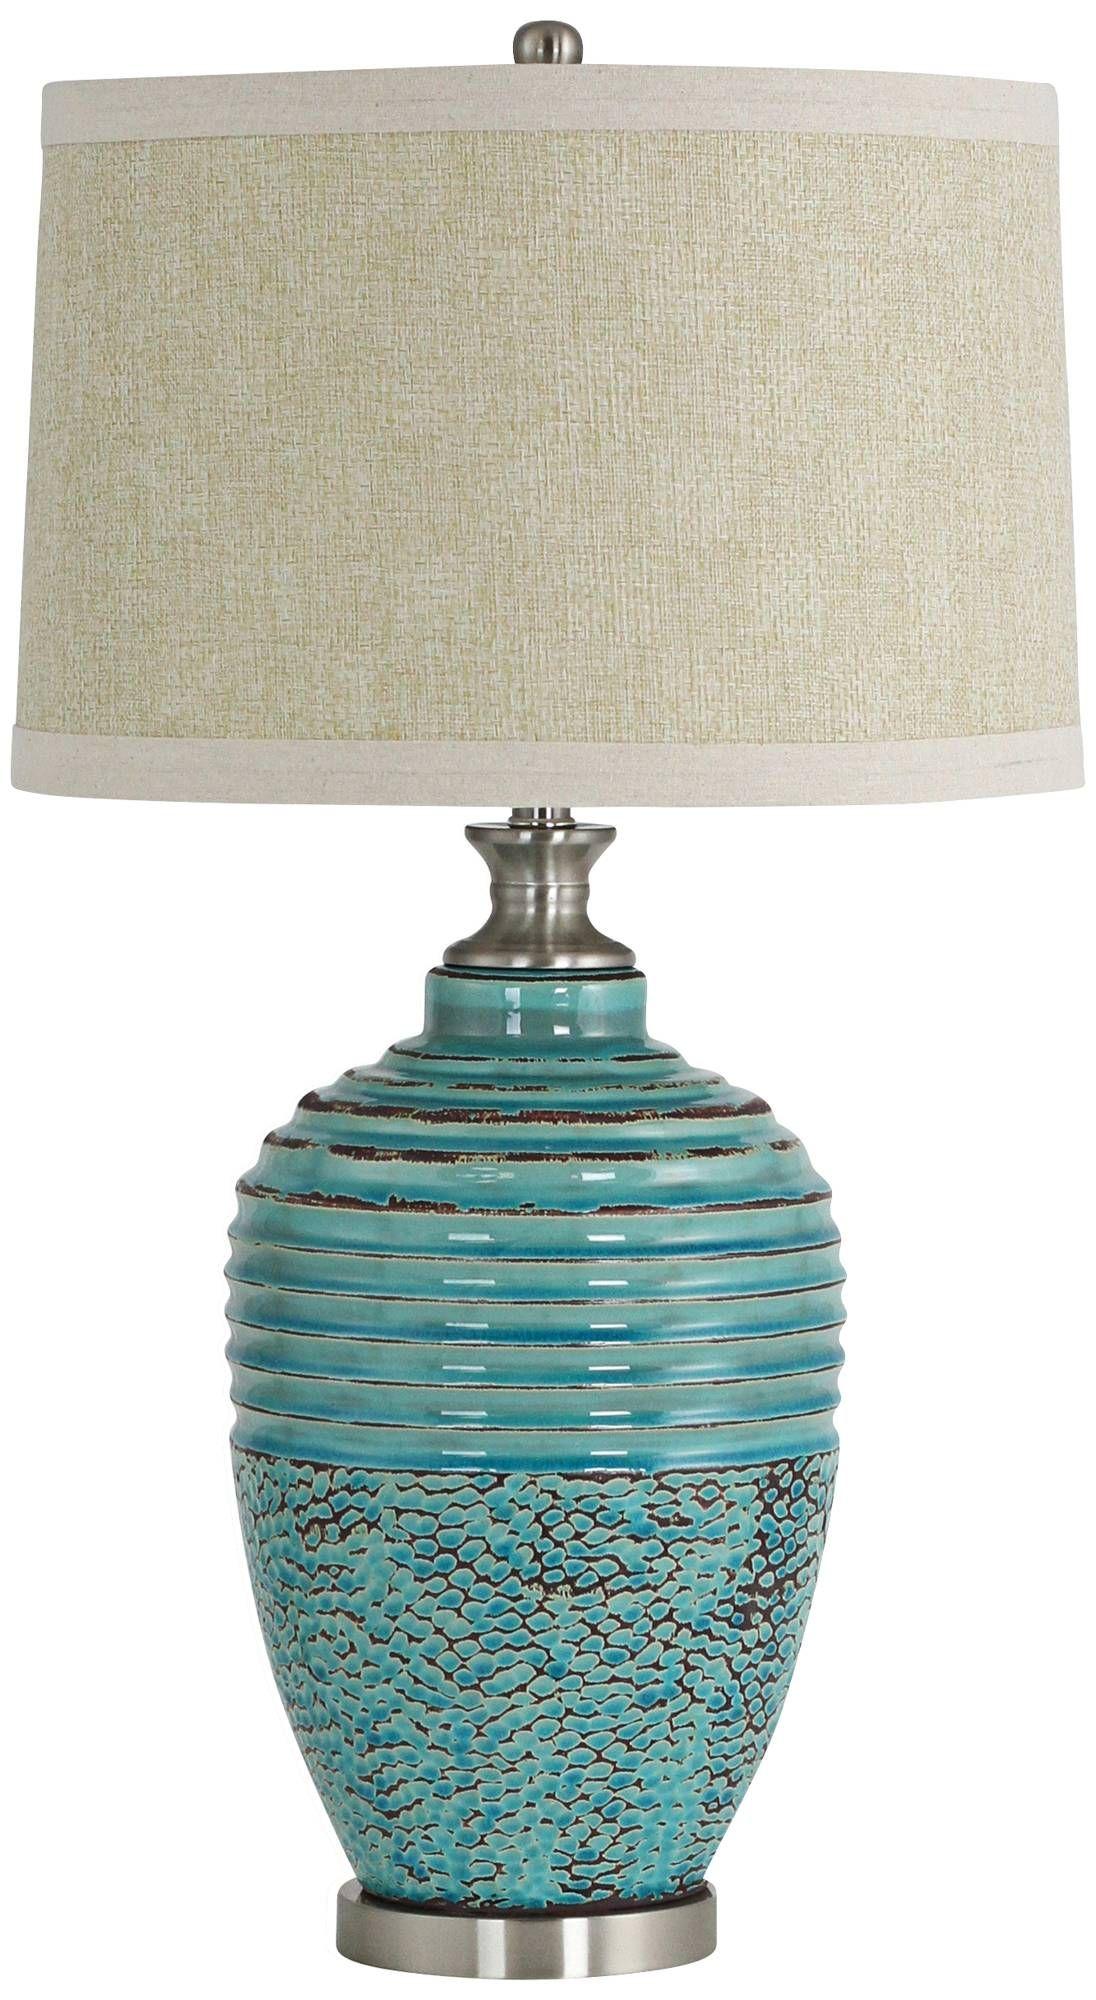 beta teal textured ceramic jug table lamp 9m134 lamps plus rh pinterest com